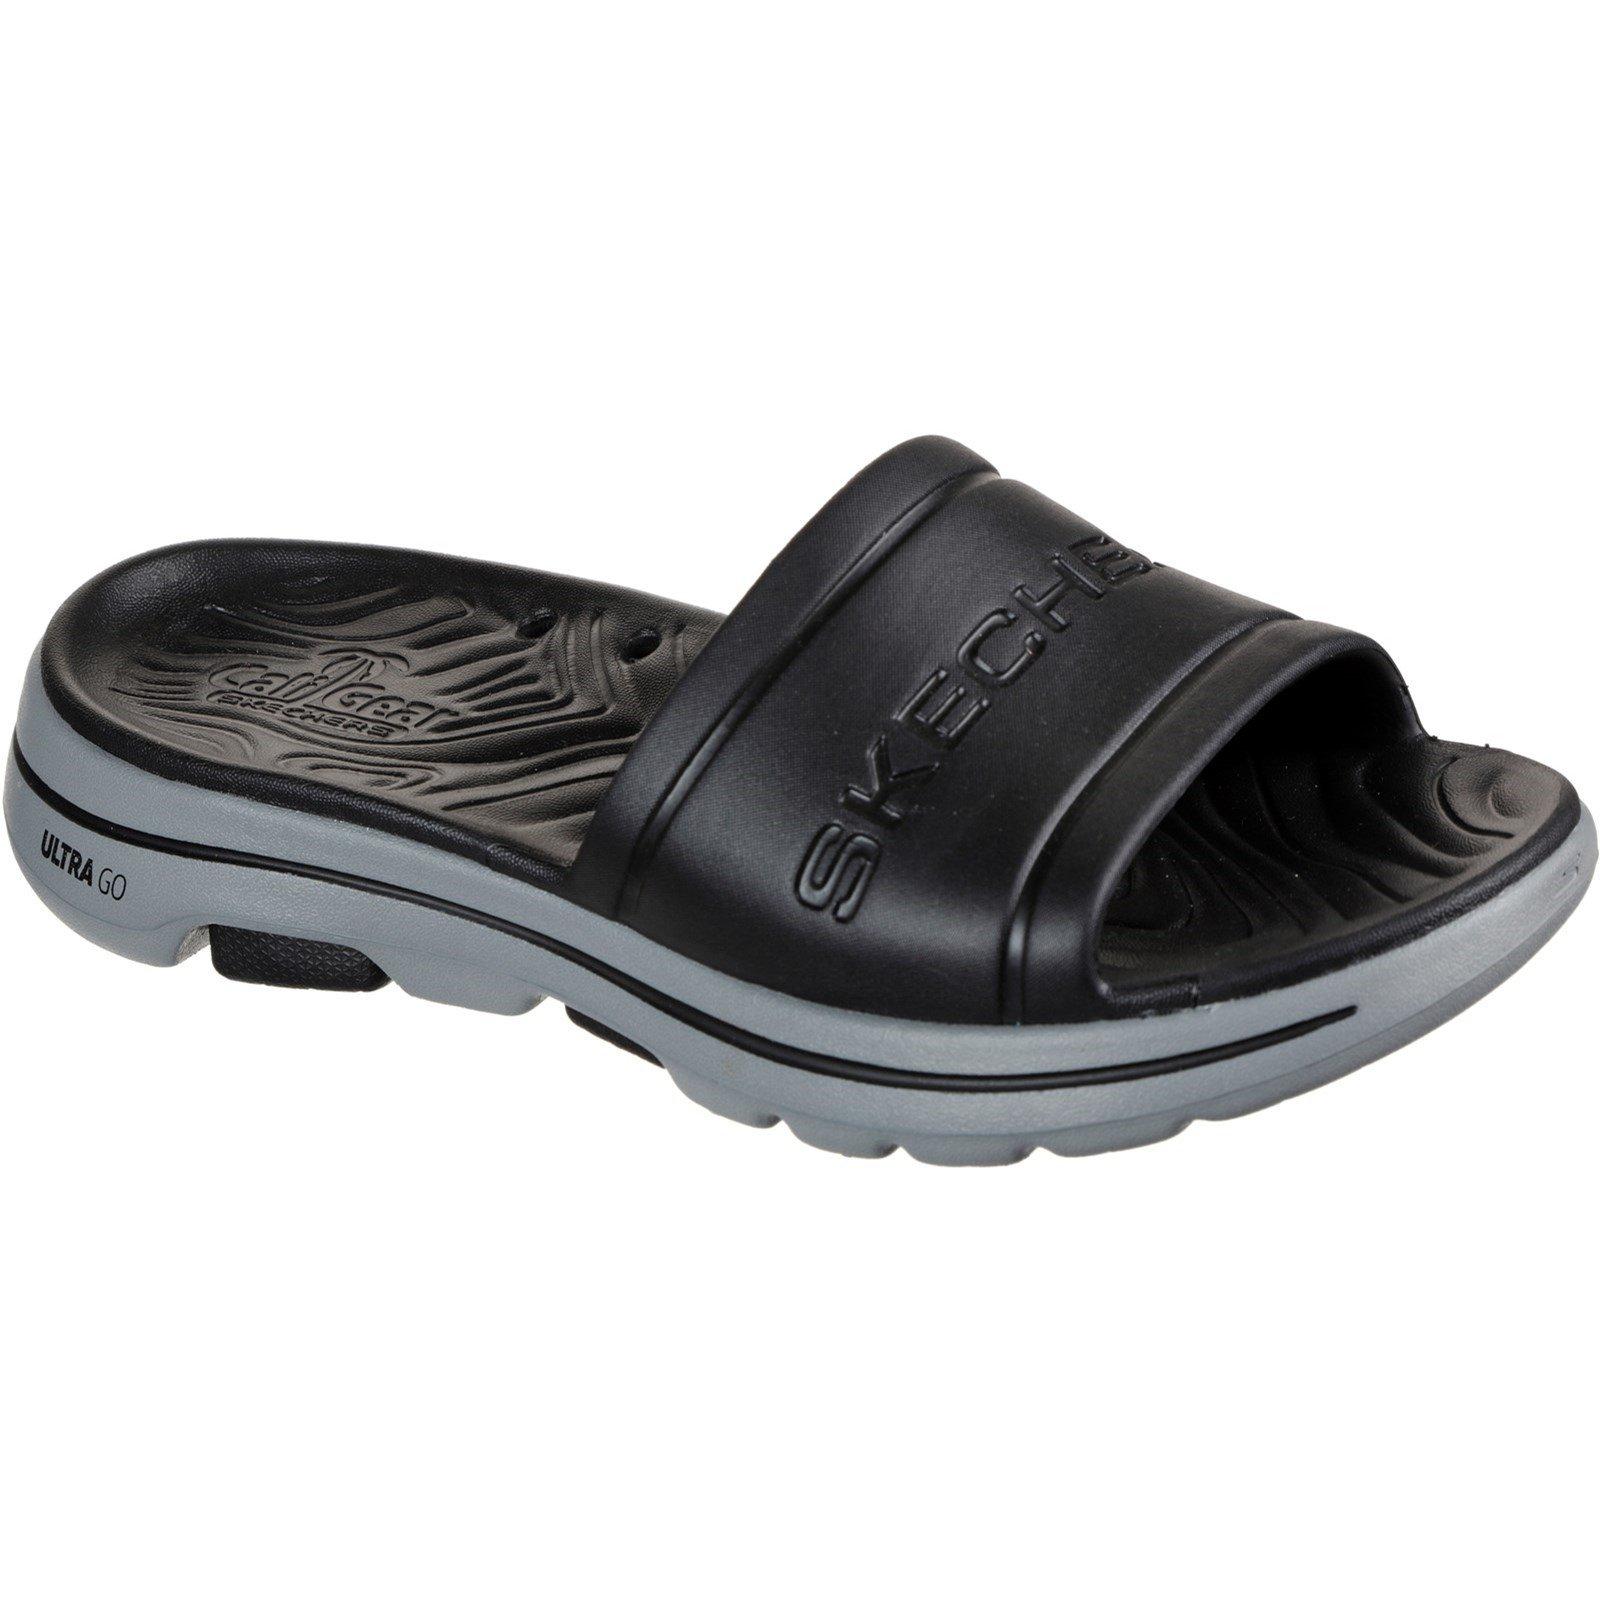 Skechers Men's Go Walk 5 Surfs Out Summer Sandal Various Colours 32207 - Black/Grey 7